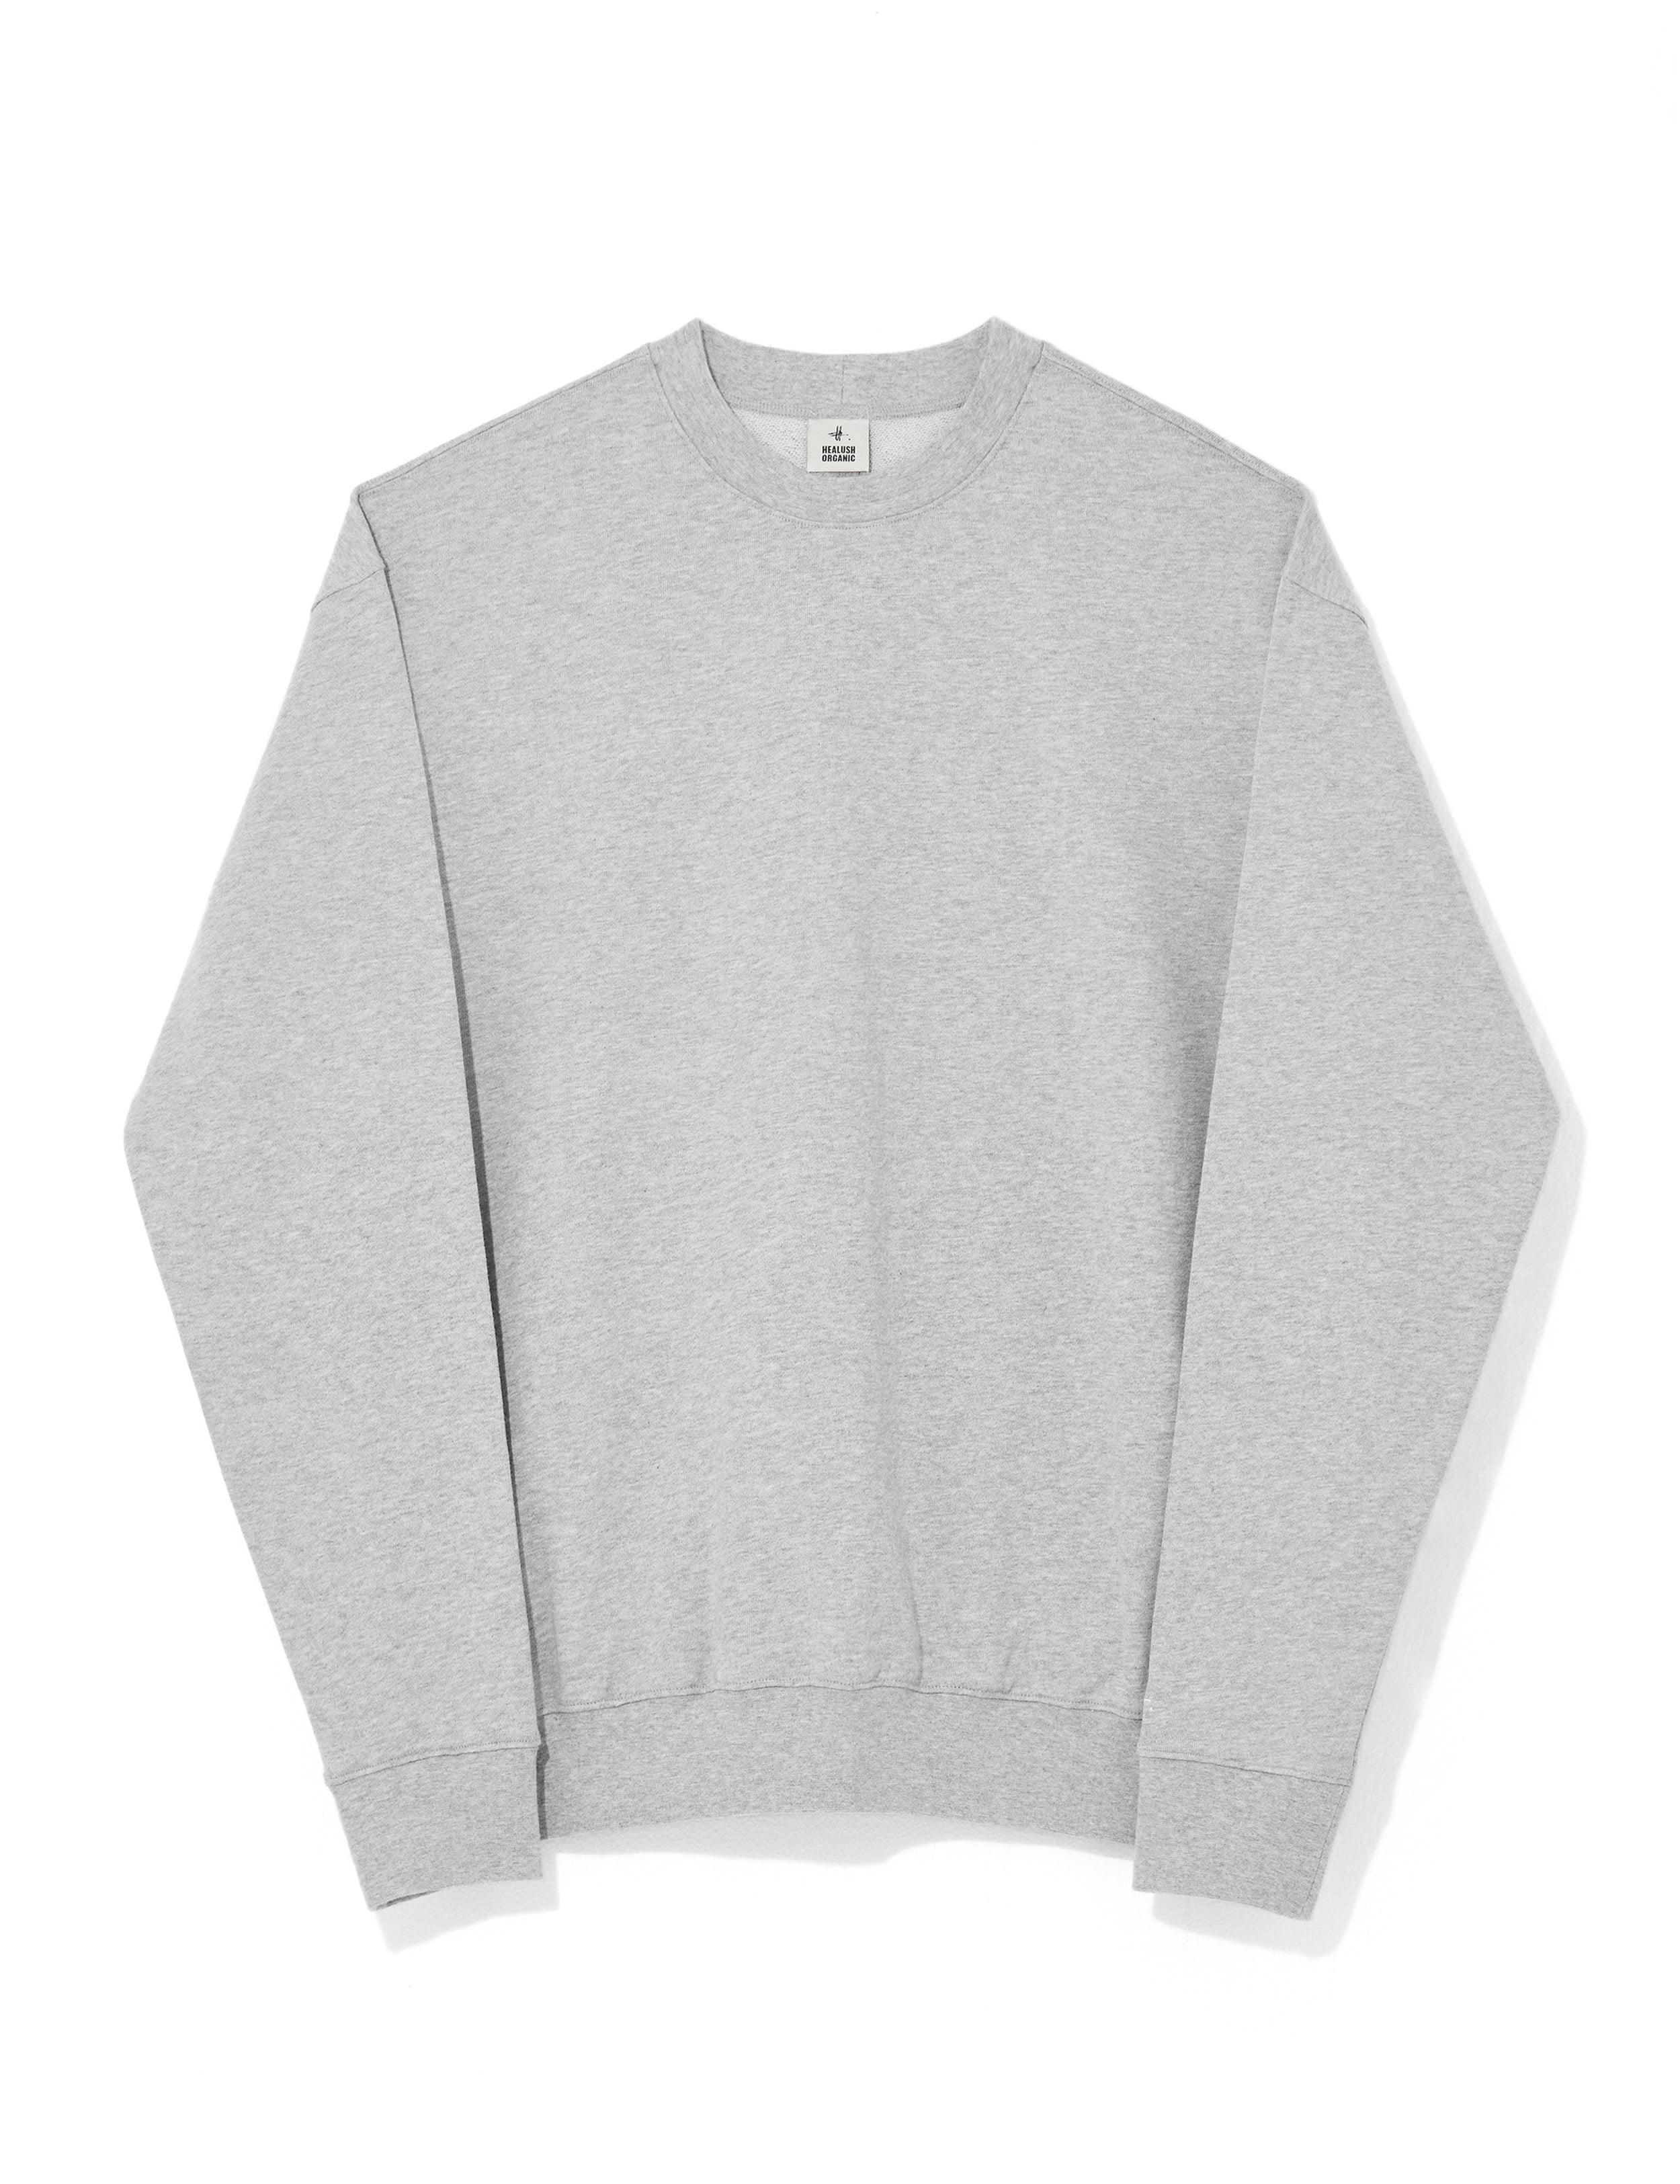 H.O Sweatshirt gray